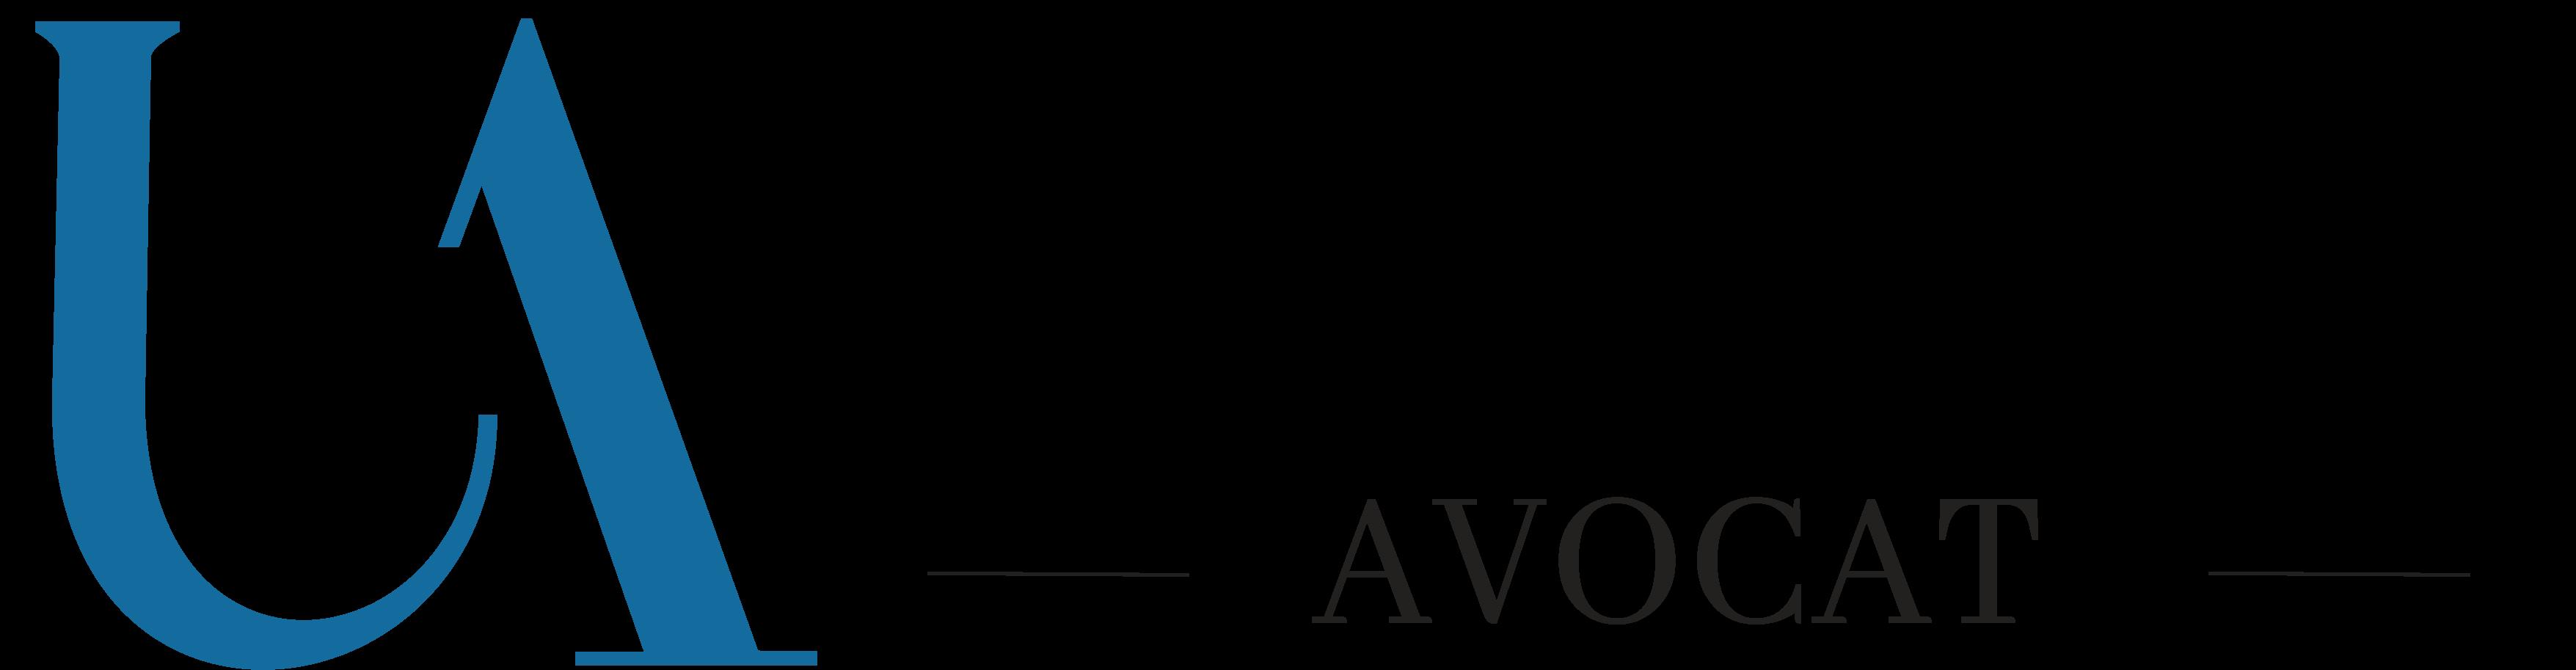 Ulrich Avocat